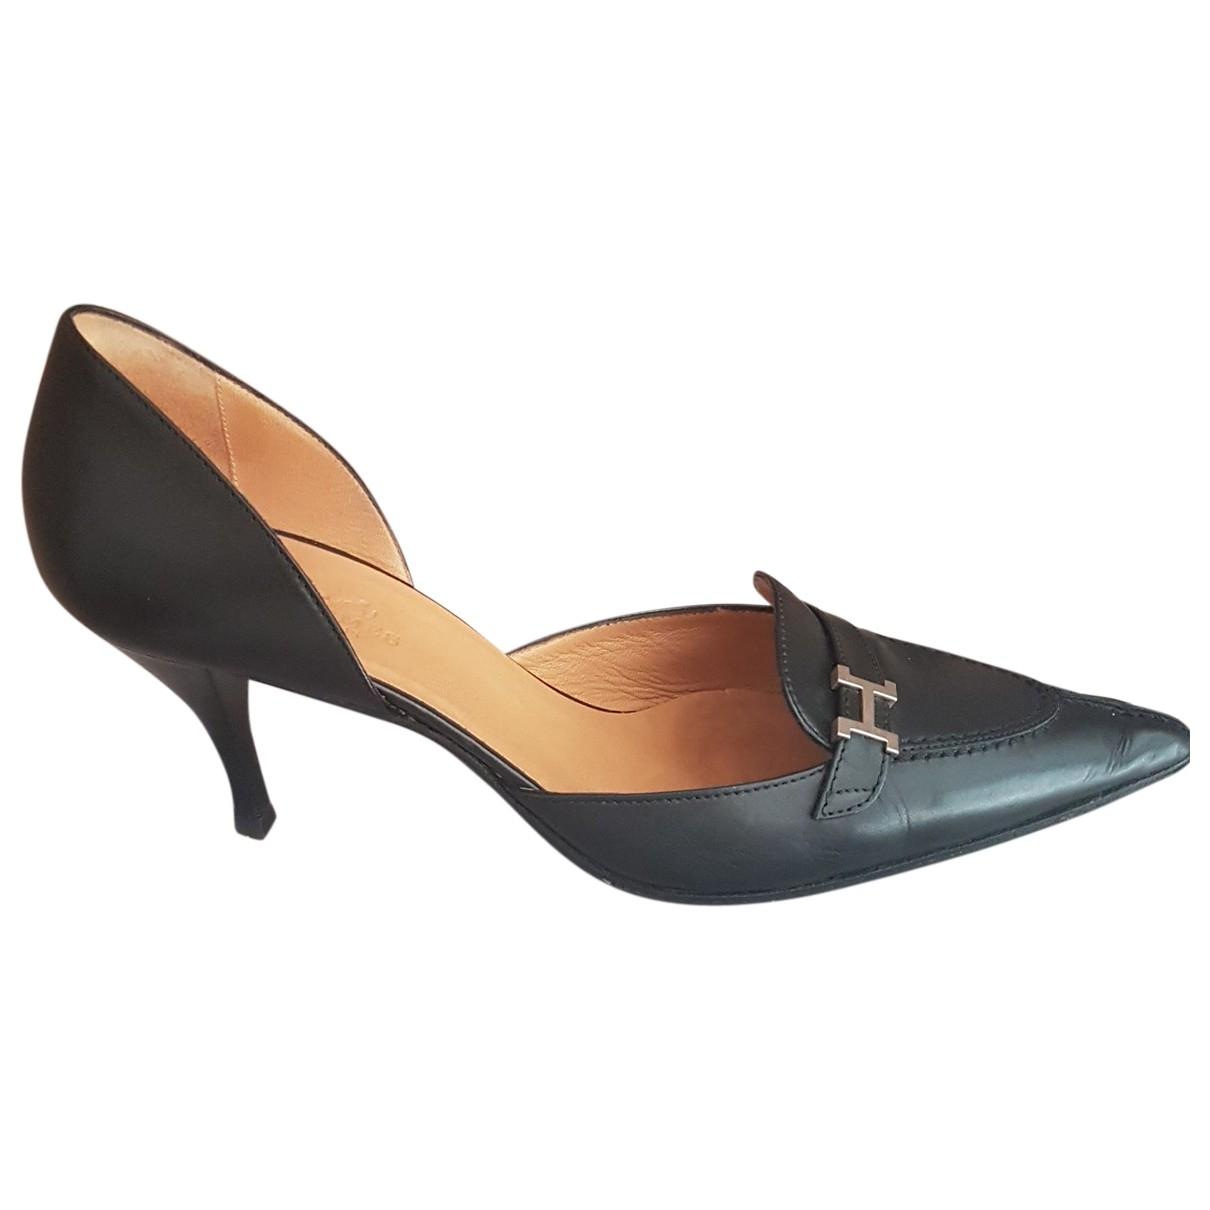 Hermès \N Black Leather Heels for Women 39 EU